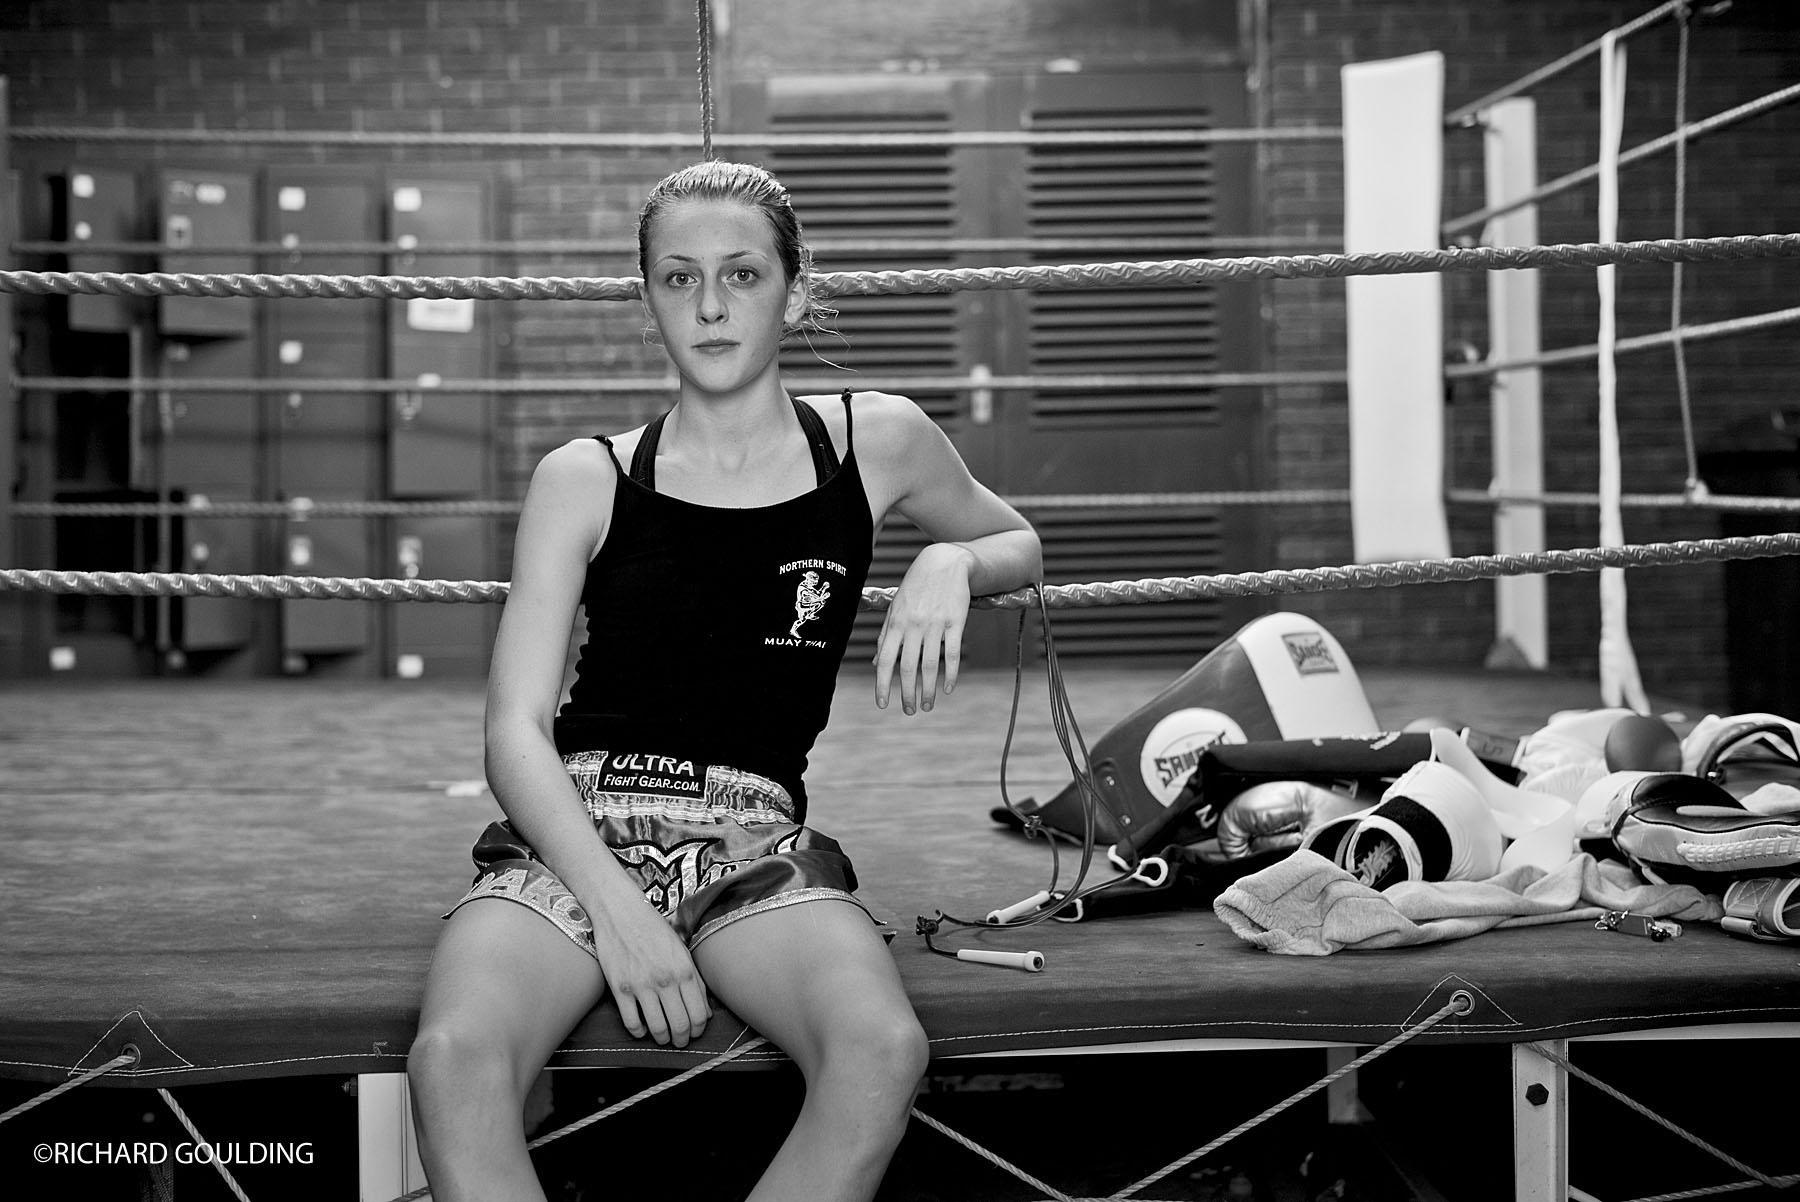 richard goulding sport photographer_SQ_30.jpg